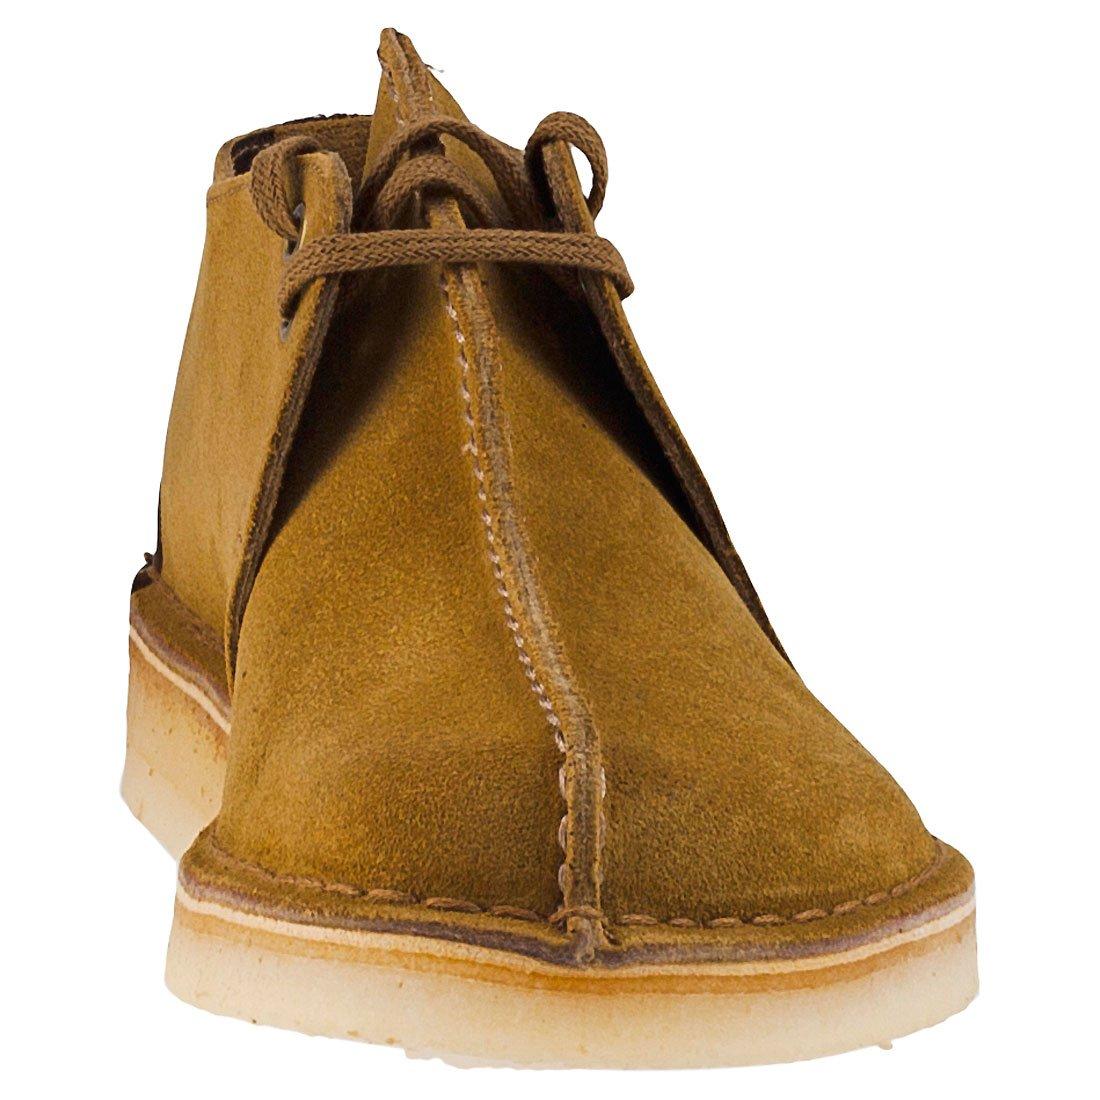 5b607e6dd25 Clarks Originals Desert Trek Hommes Chaussures